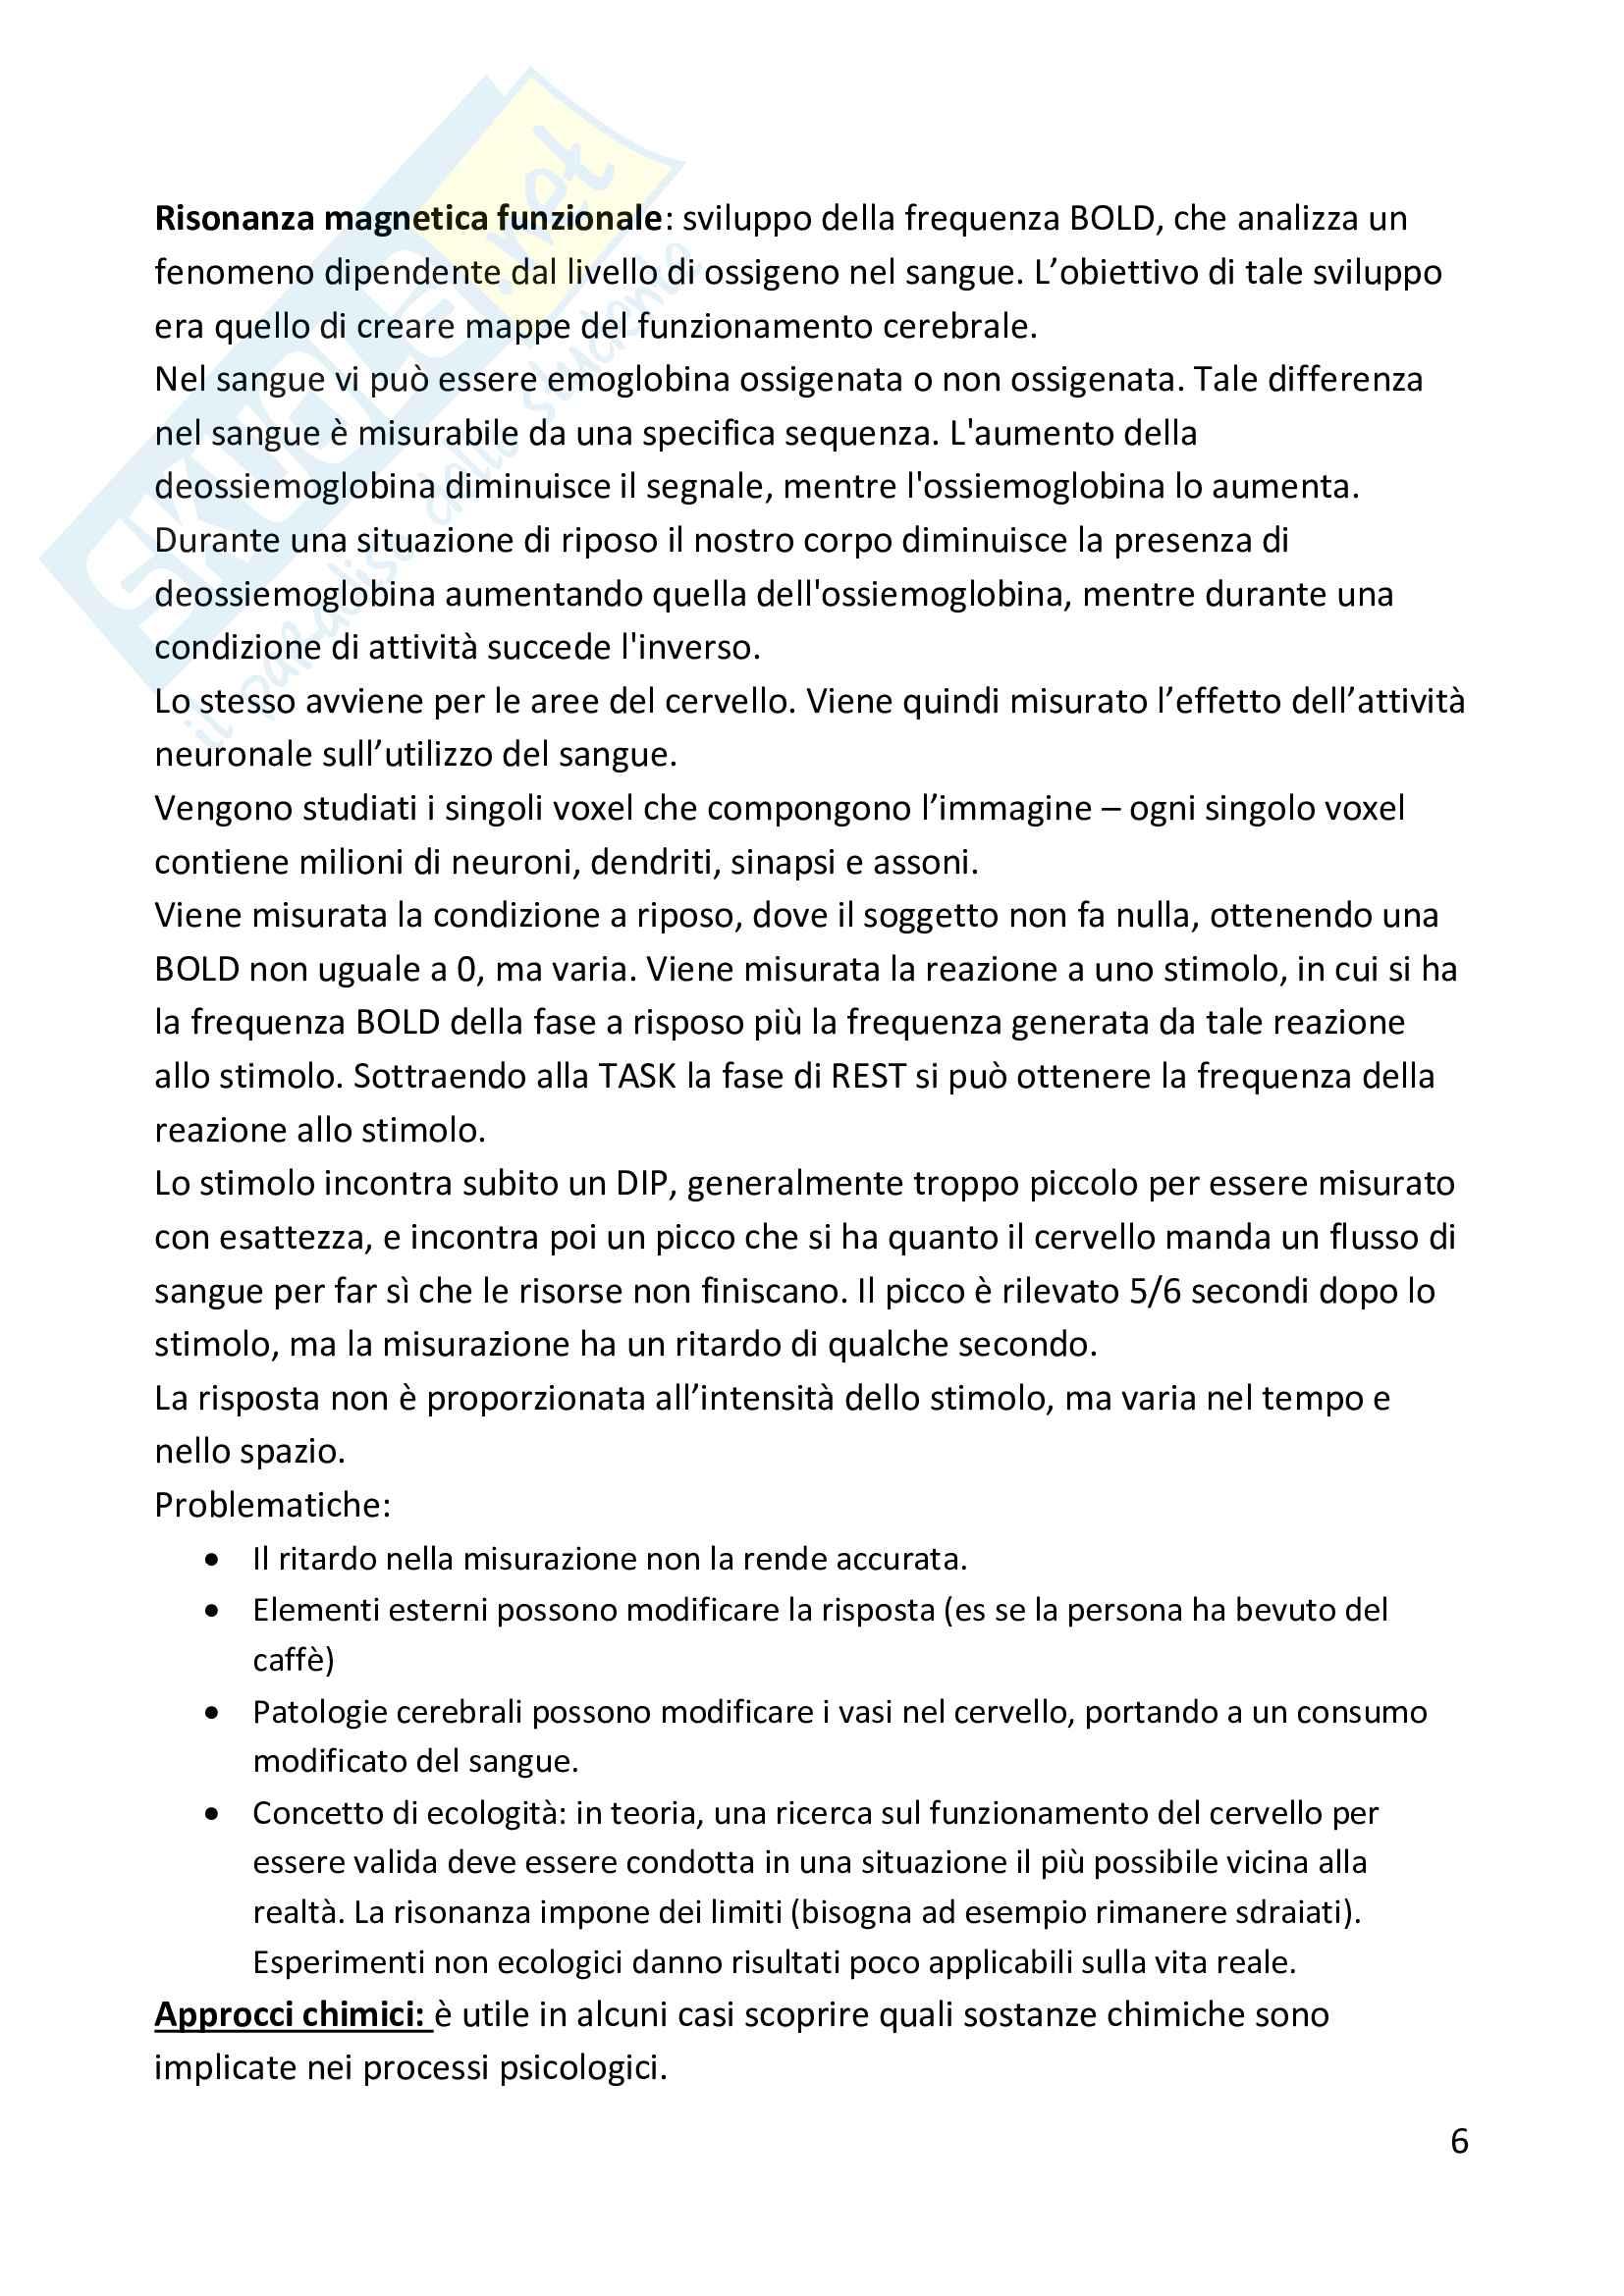 Riassunto esame psicologia fisiologica, prof Cauda, libro Psicologia Fisiologica, Wagner, Silber Pag. 6